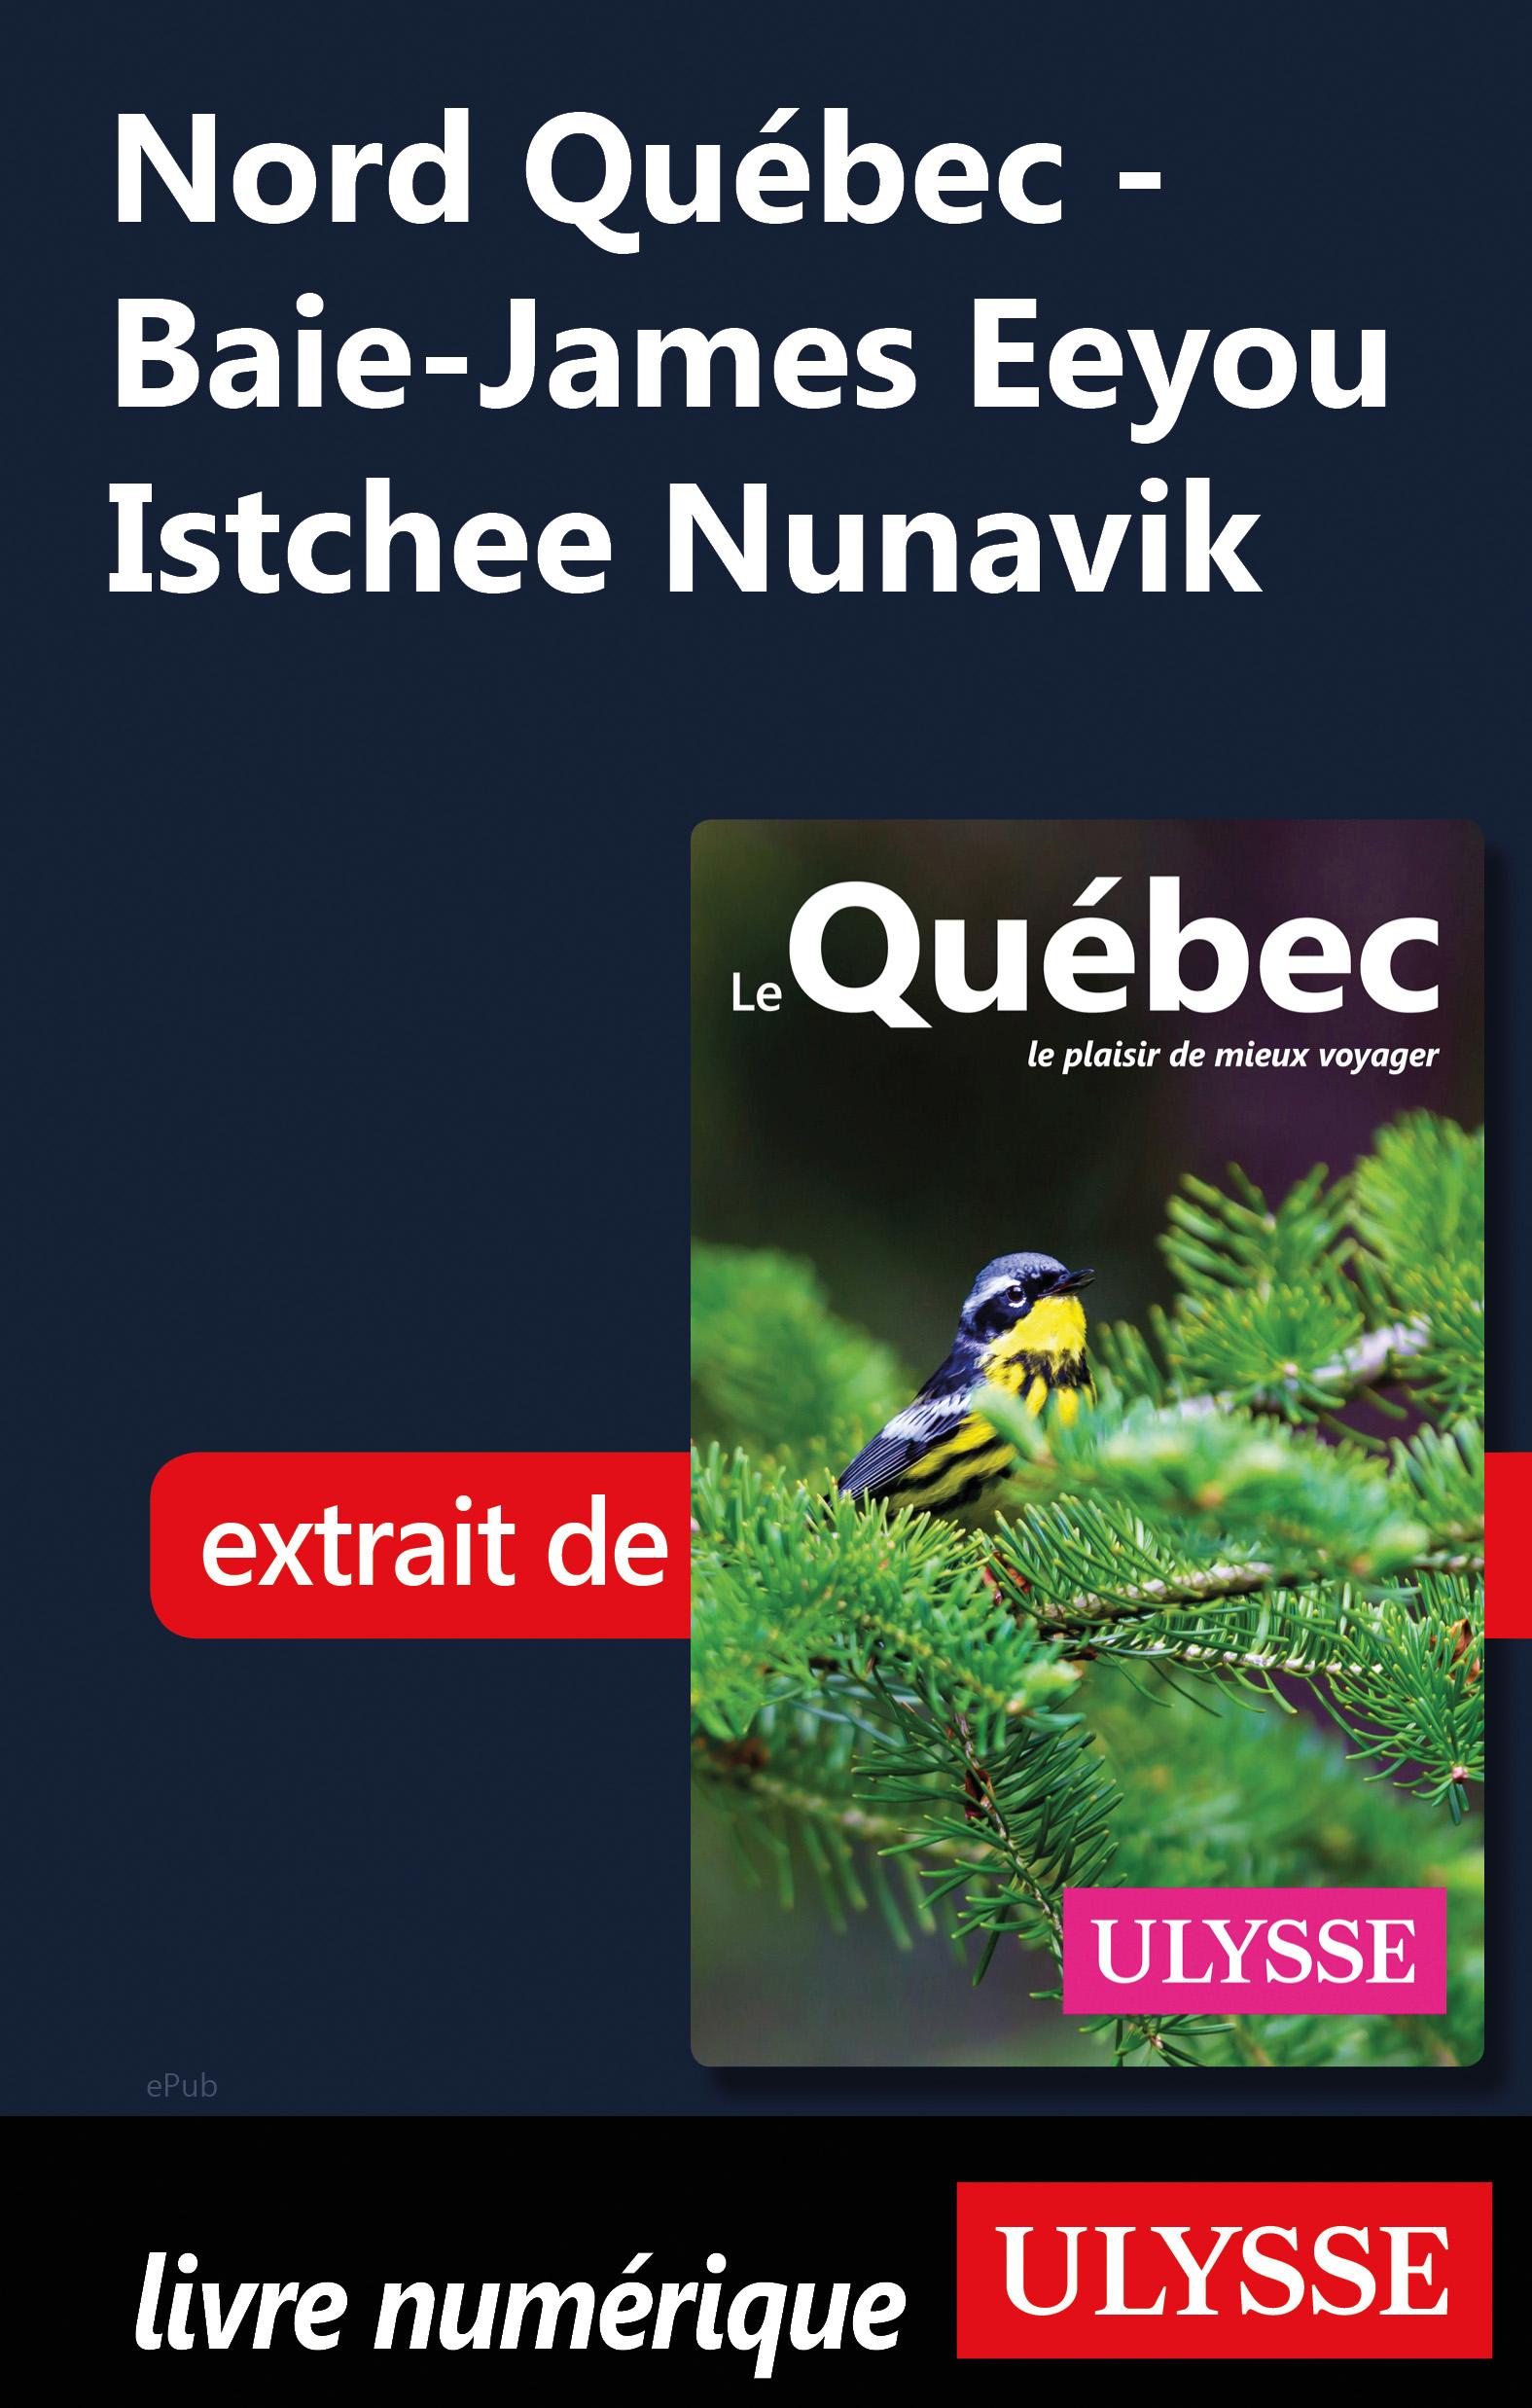 Nord Québec - Baie-James Eeyou Istchee Nunavik